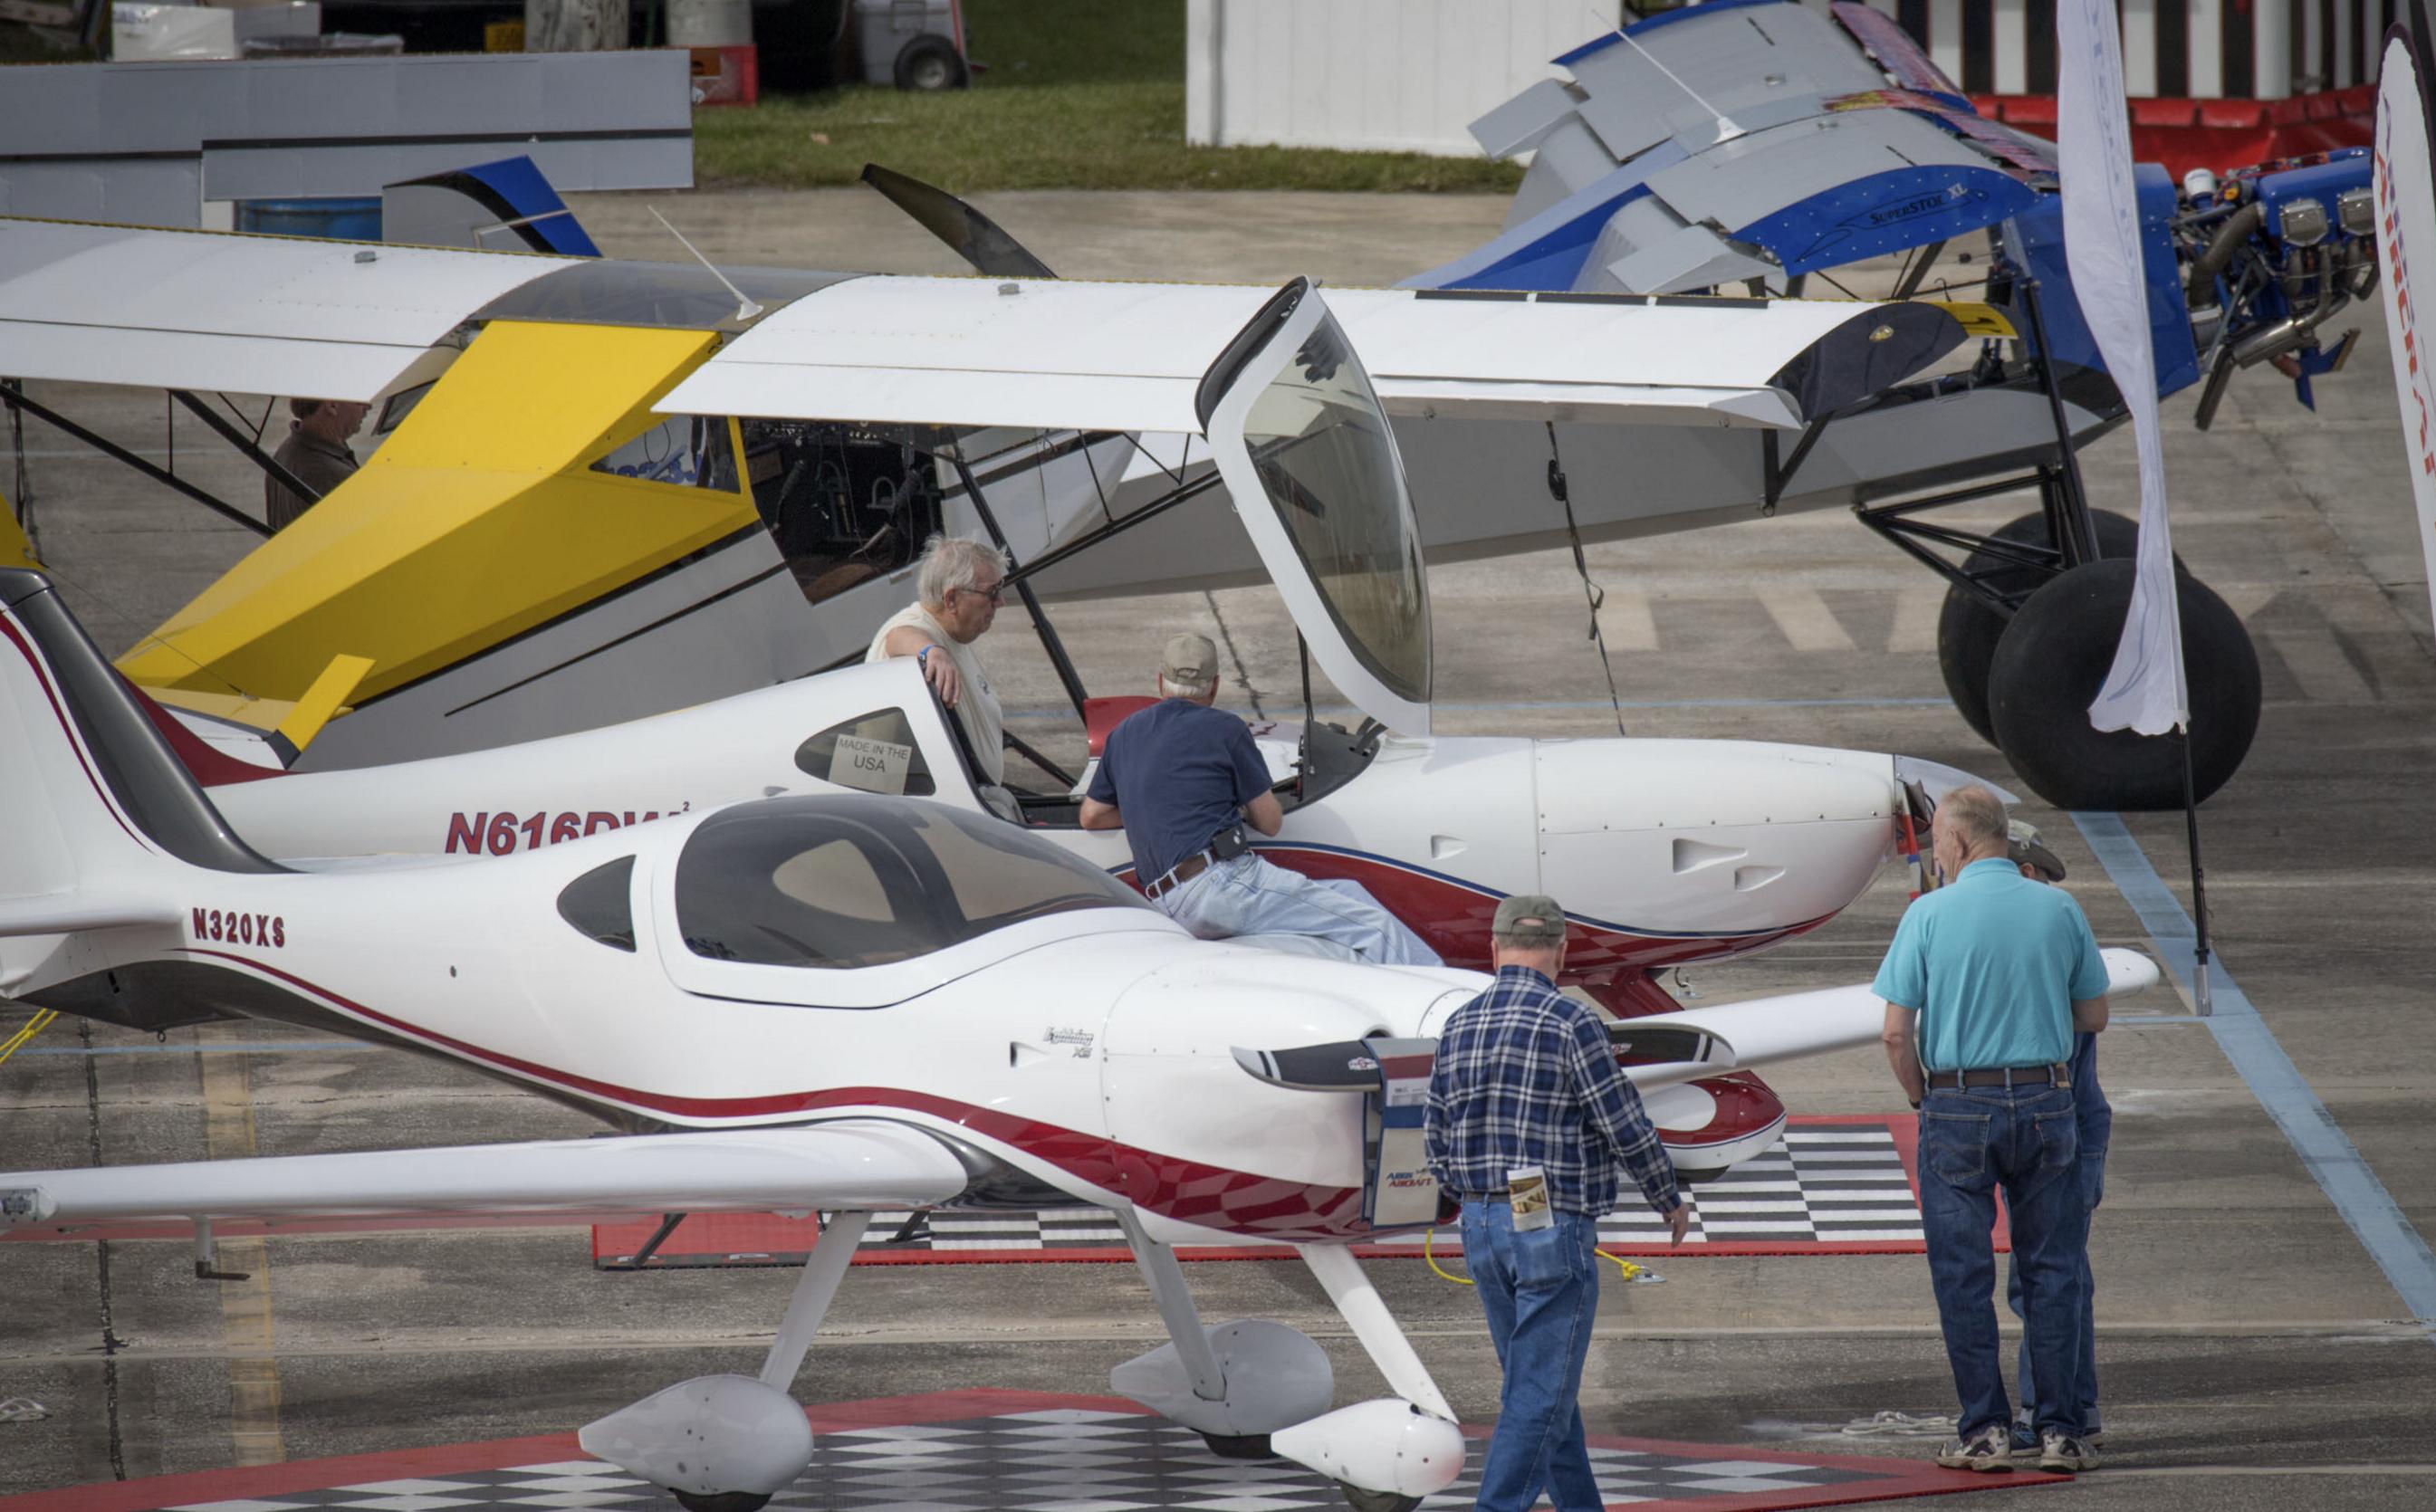 Sebring 2016. Photo credit: Sebring Aviation Expo (http://www.sportaviationexpo.com/)